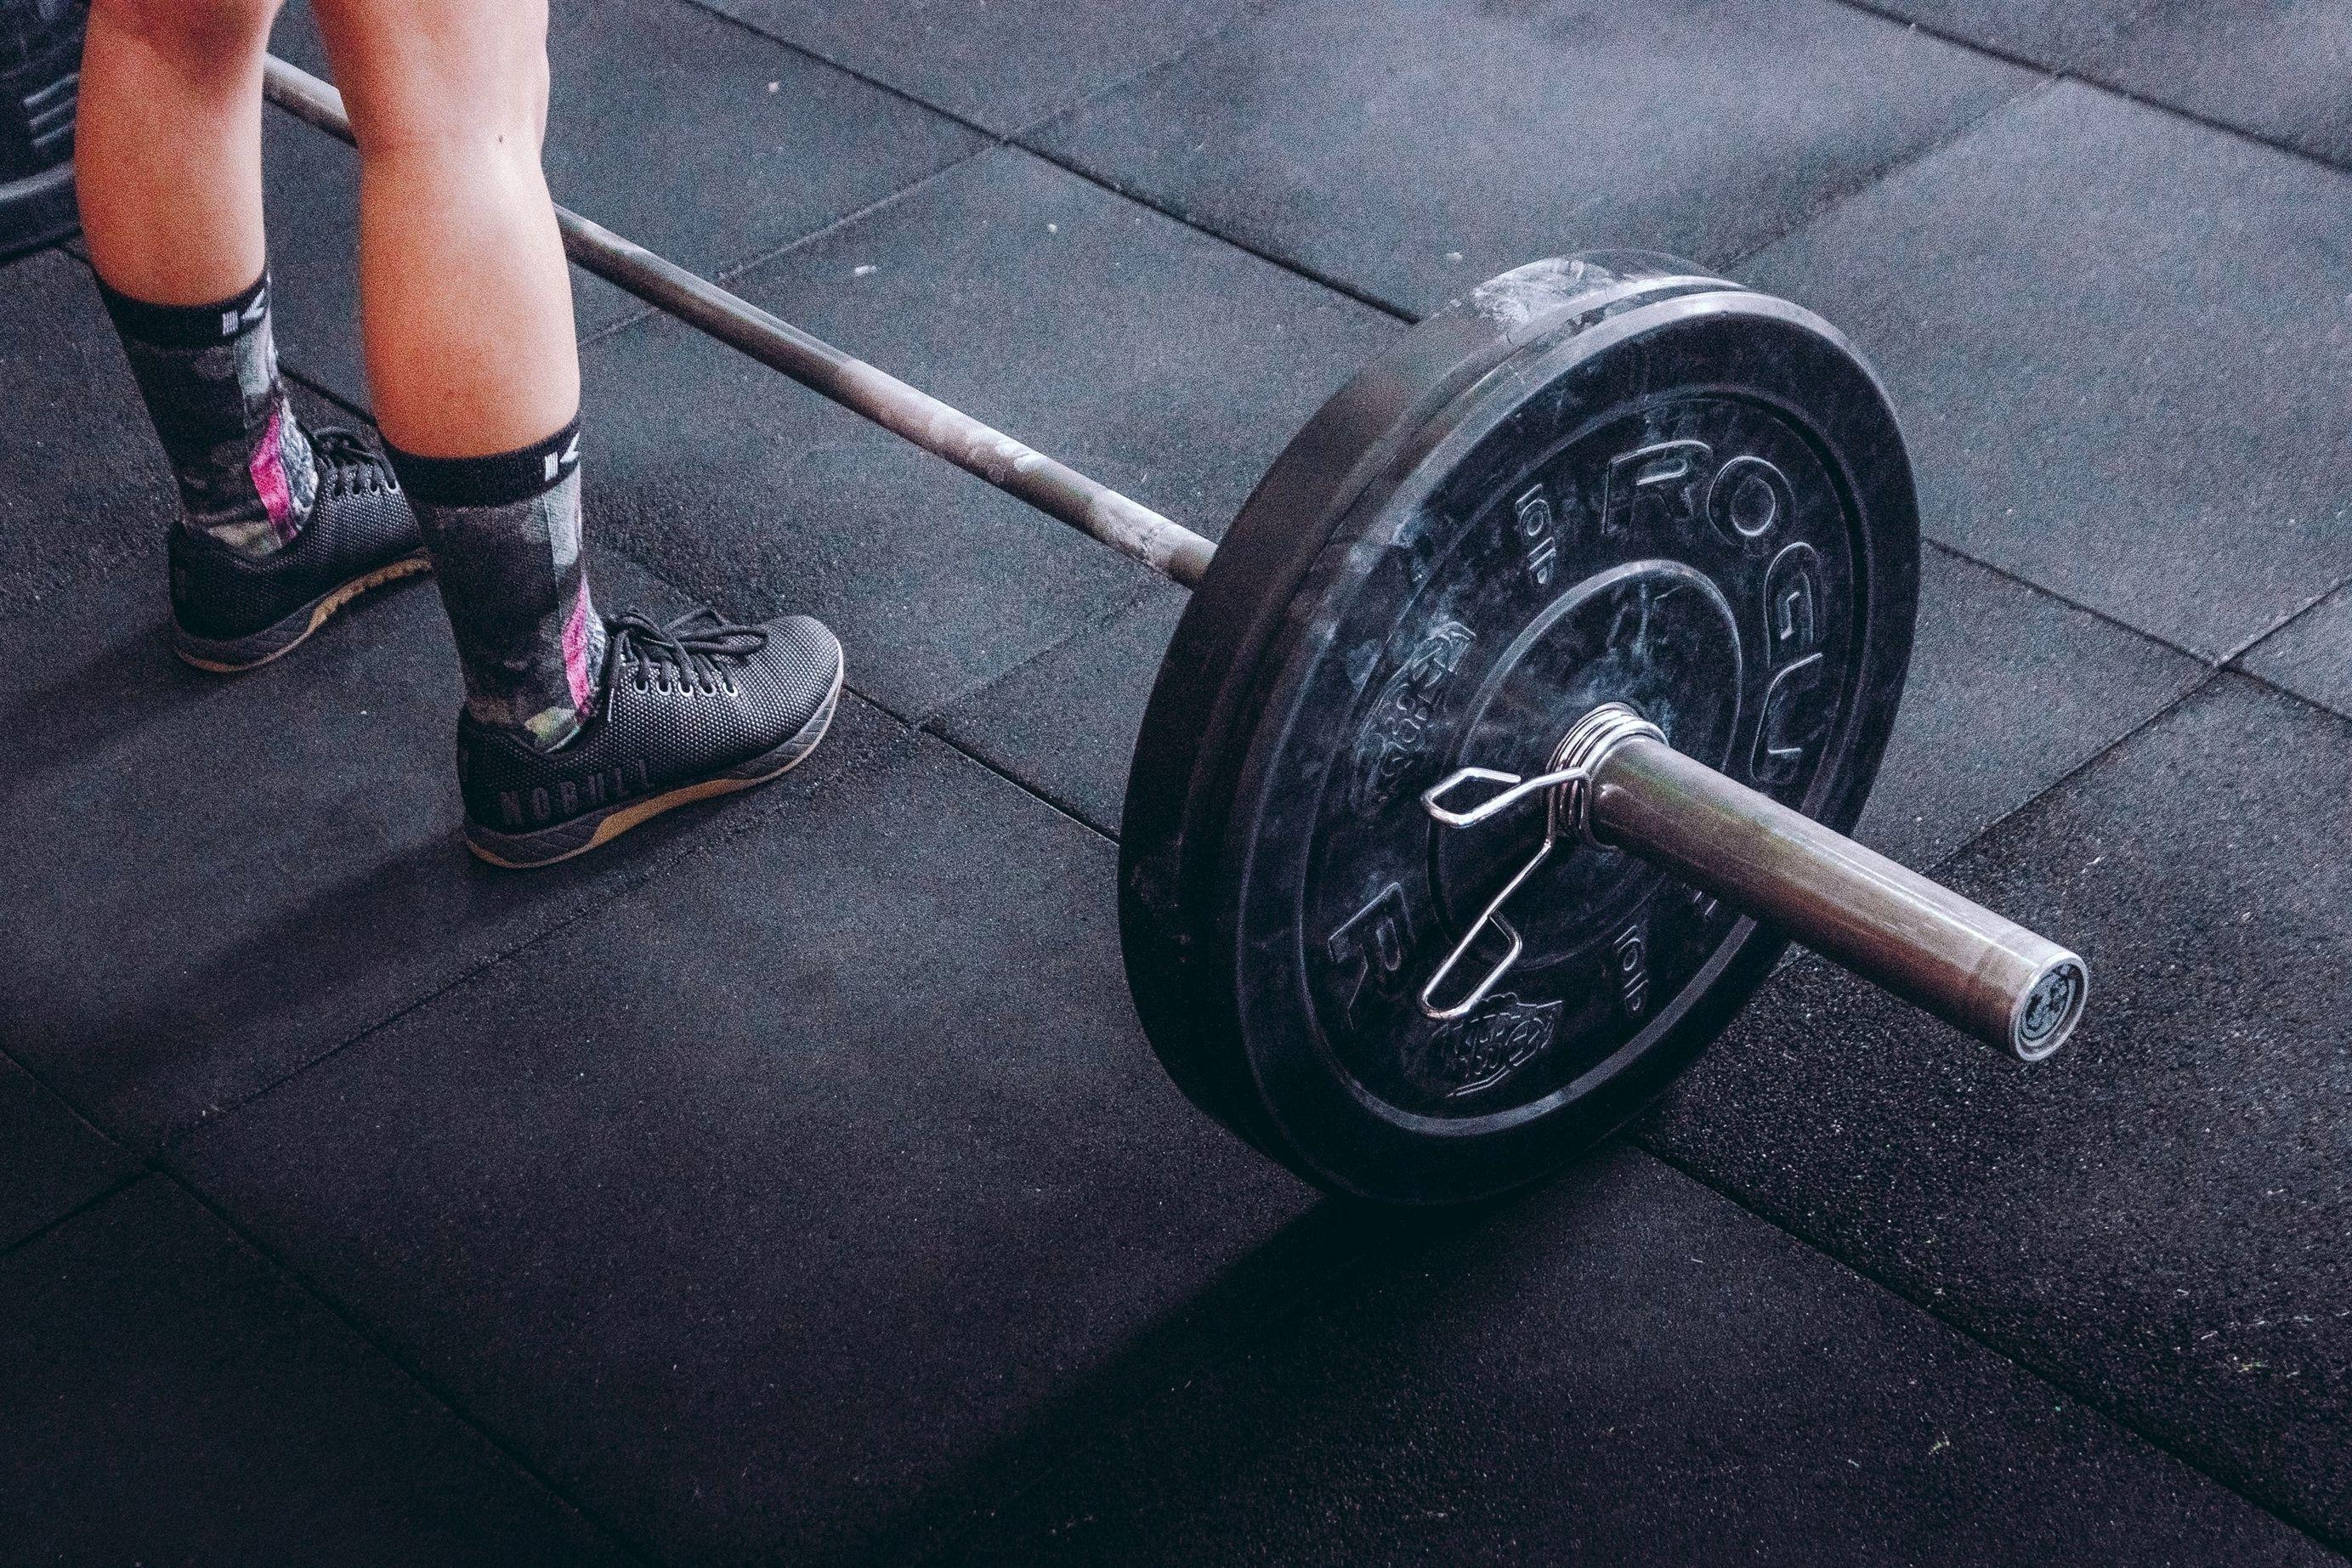 #filler #Fitness #journal512019112320474152 #Nutrition #Sandbag #fitness and nutrition journal_51_20...